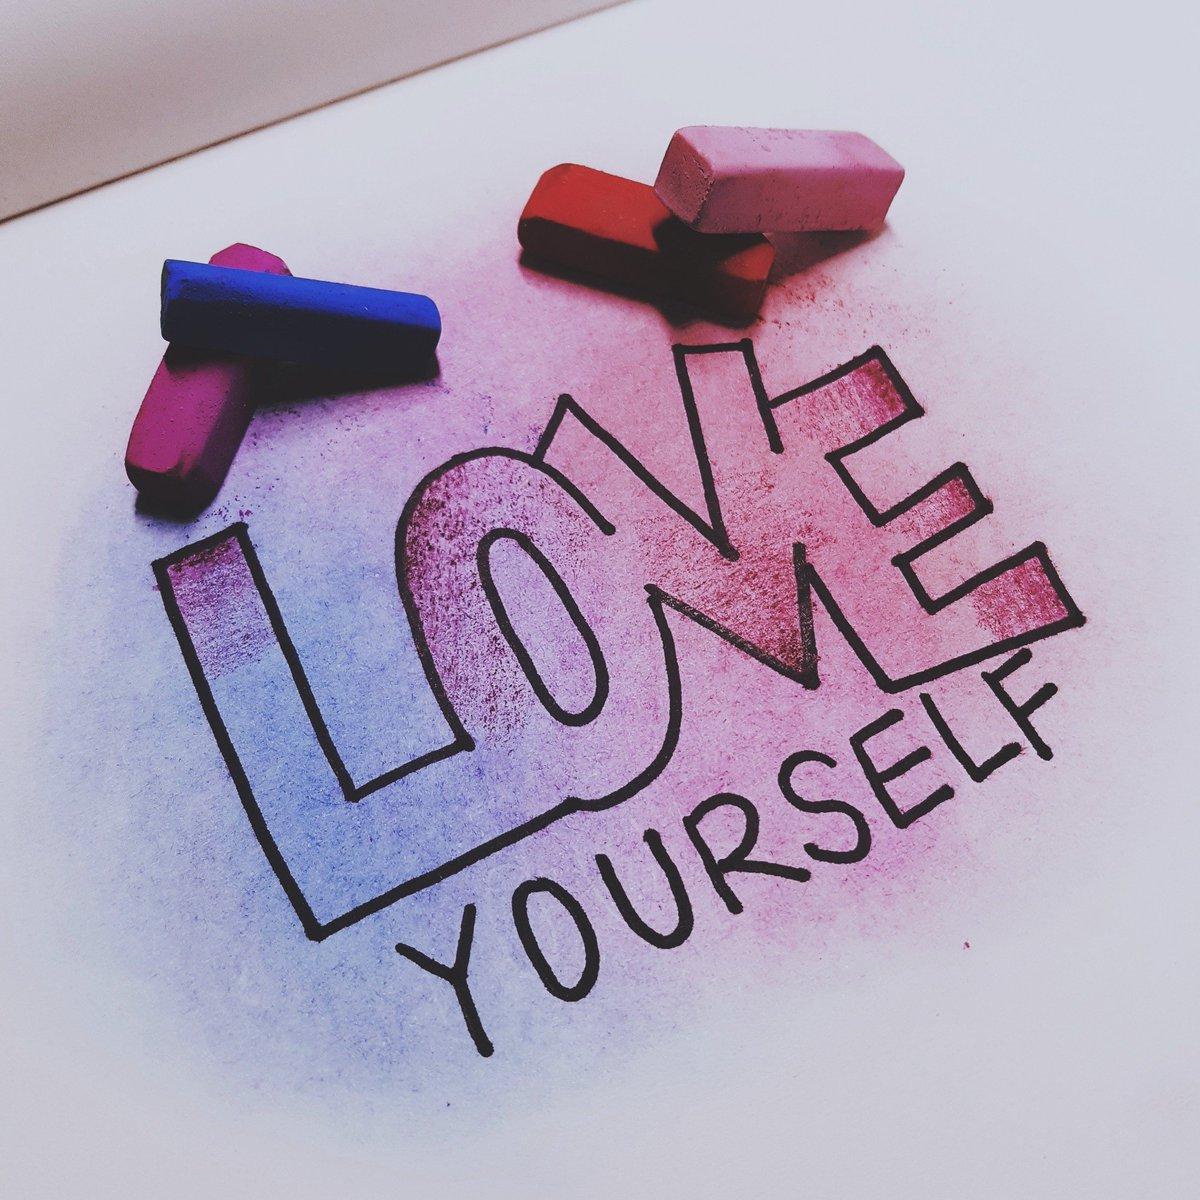 LOVE YOURSELF @BTS_twt   #13분캘리 #LOVE_YO...